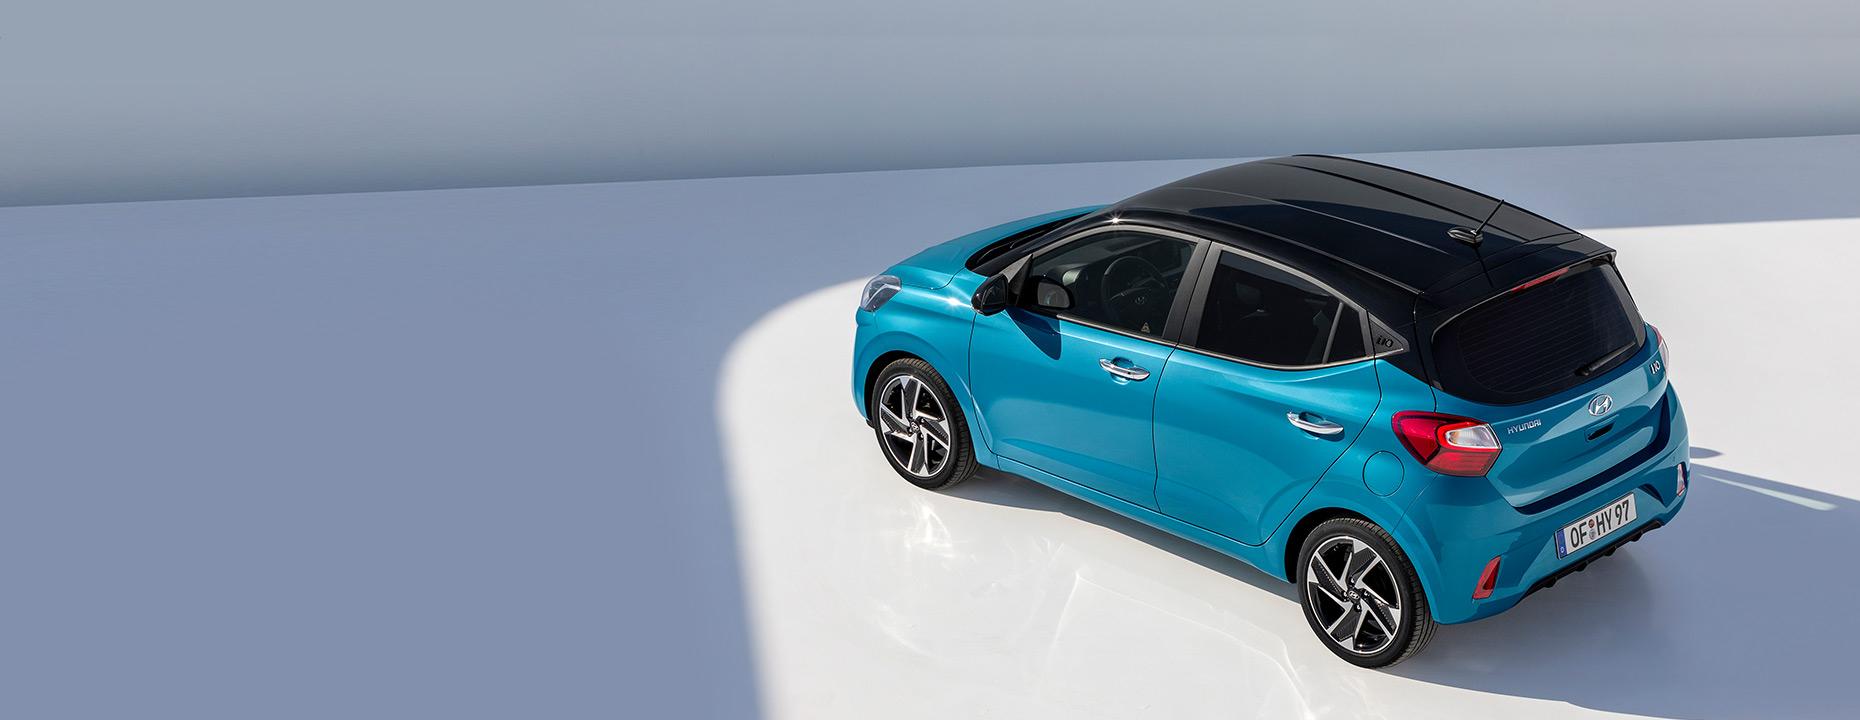 Hyundai   Binek, Suv Ve Ticari Araç Modelleri serapportantà Gamm Vert Salon De Jardin